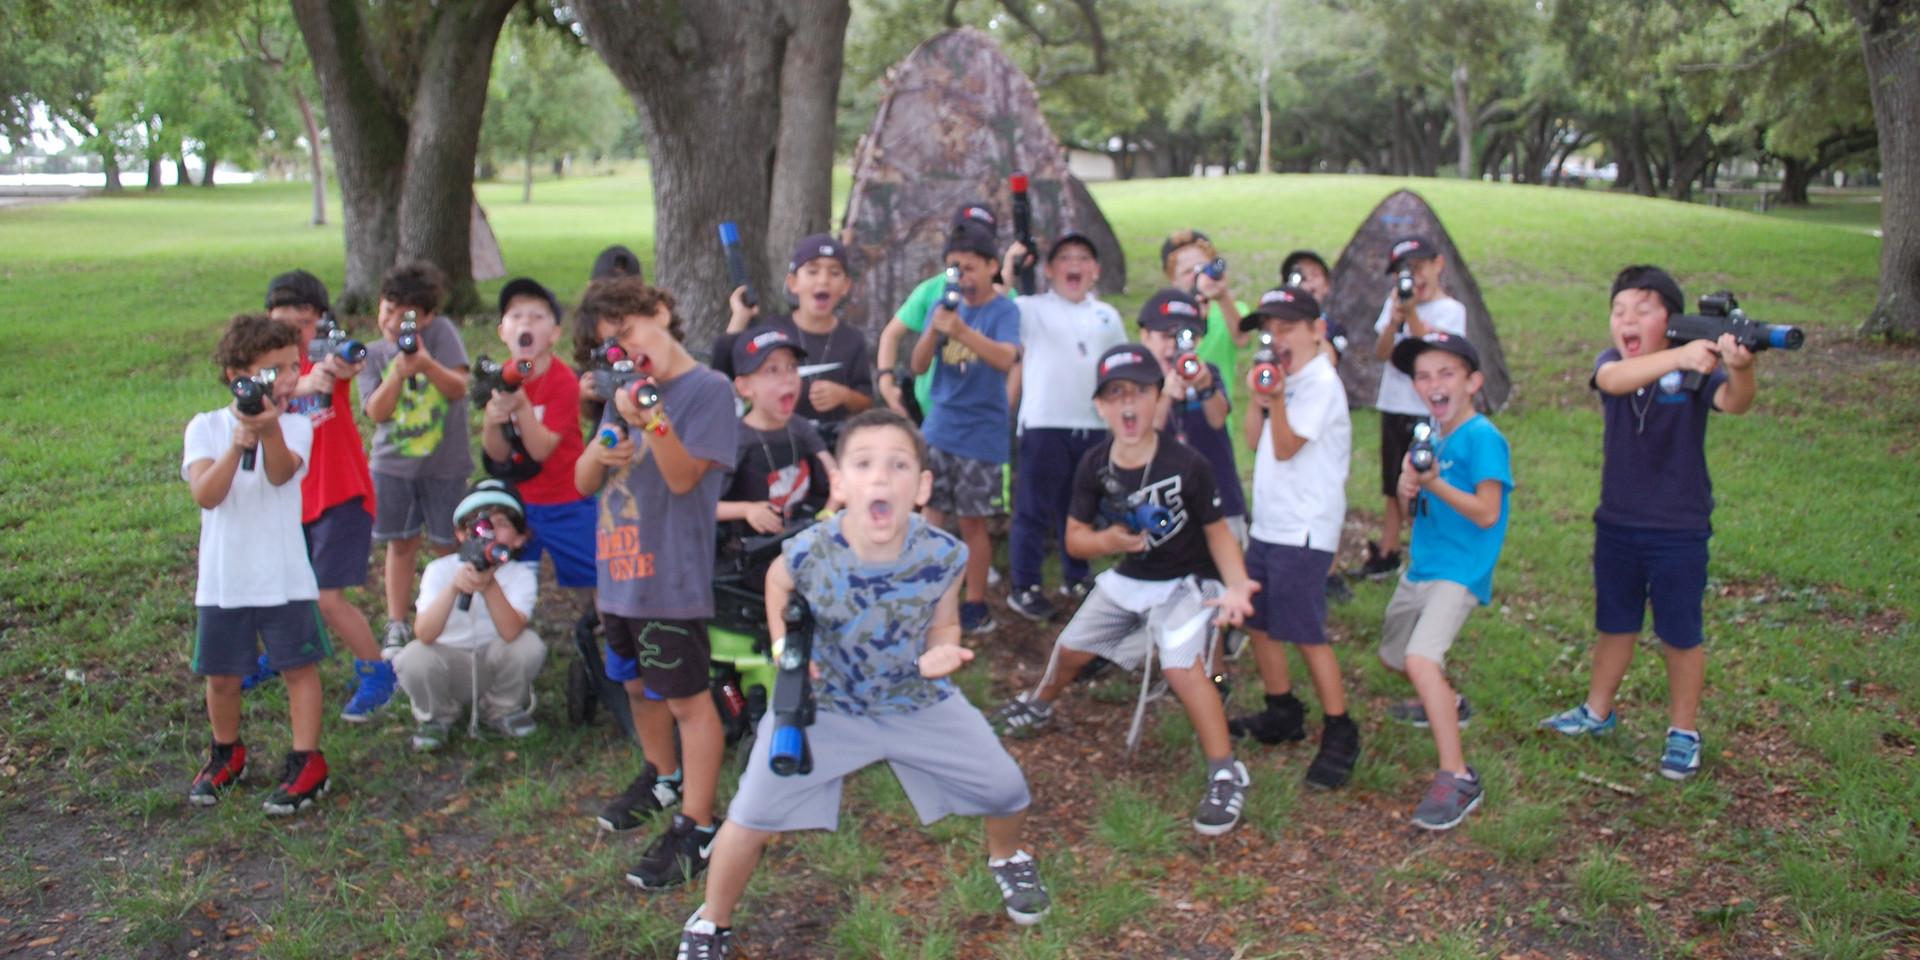 Birthday Party ideas in Parrish FL